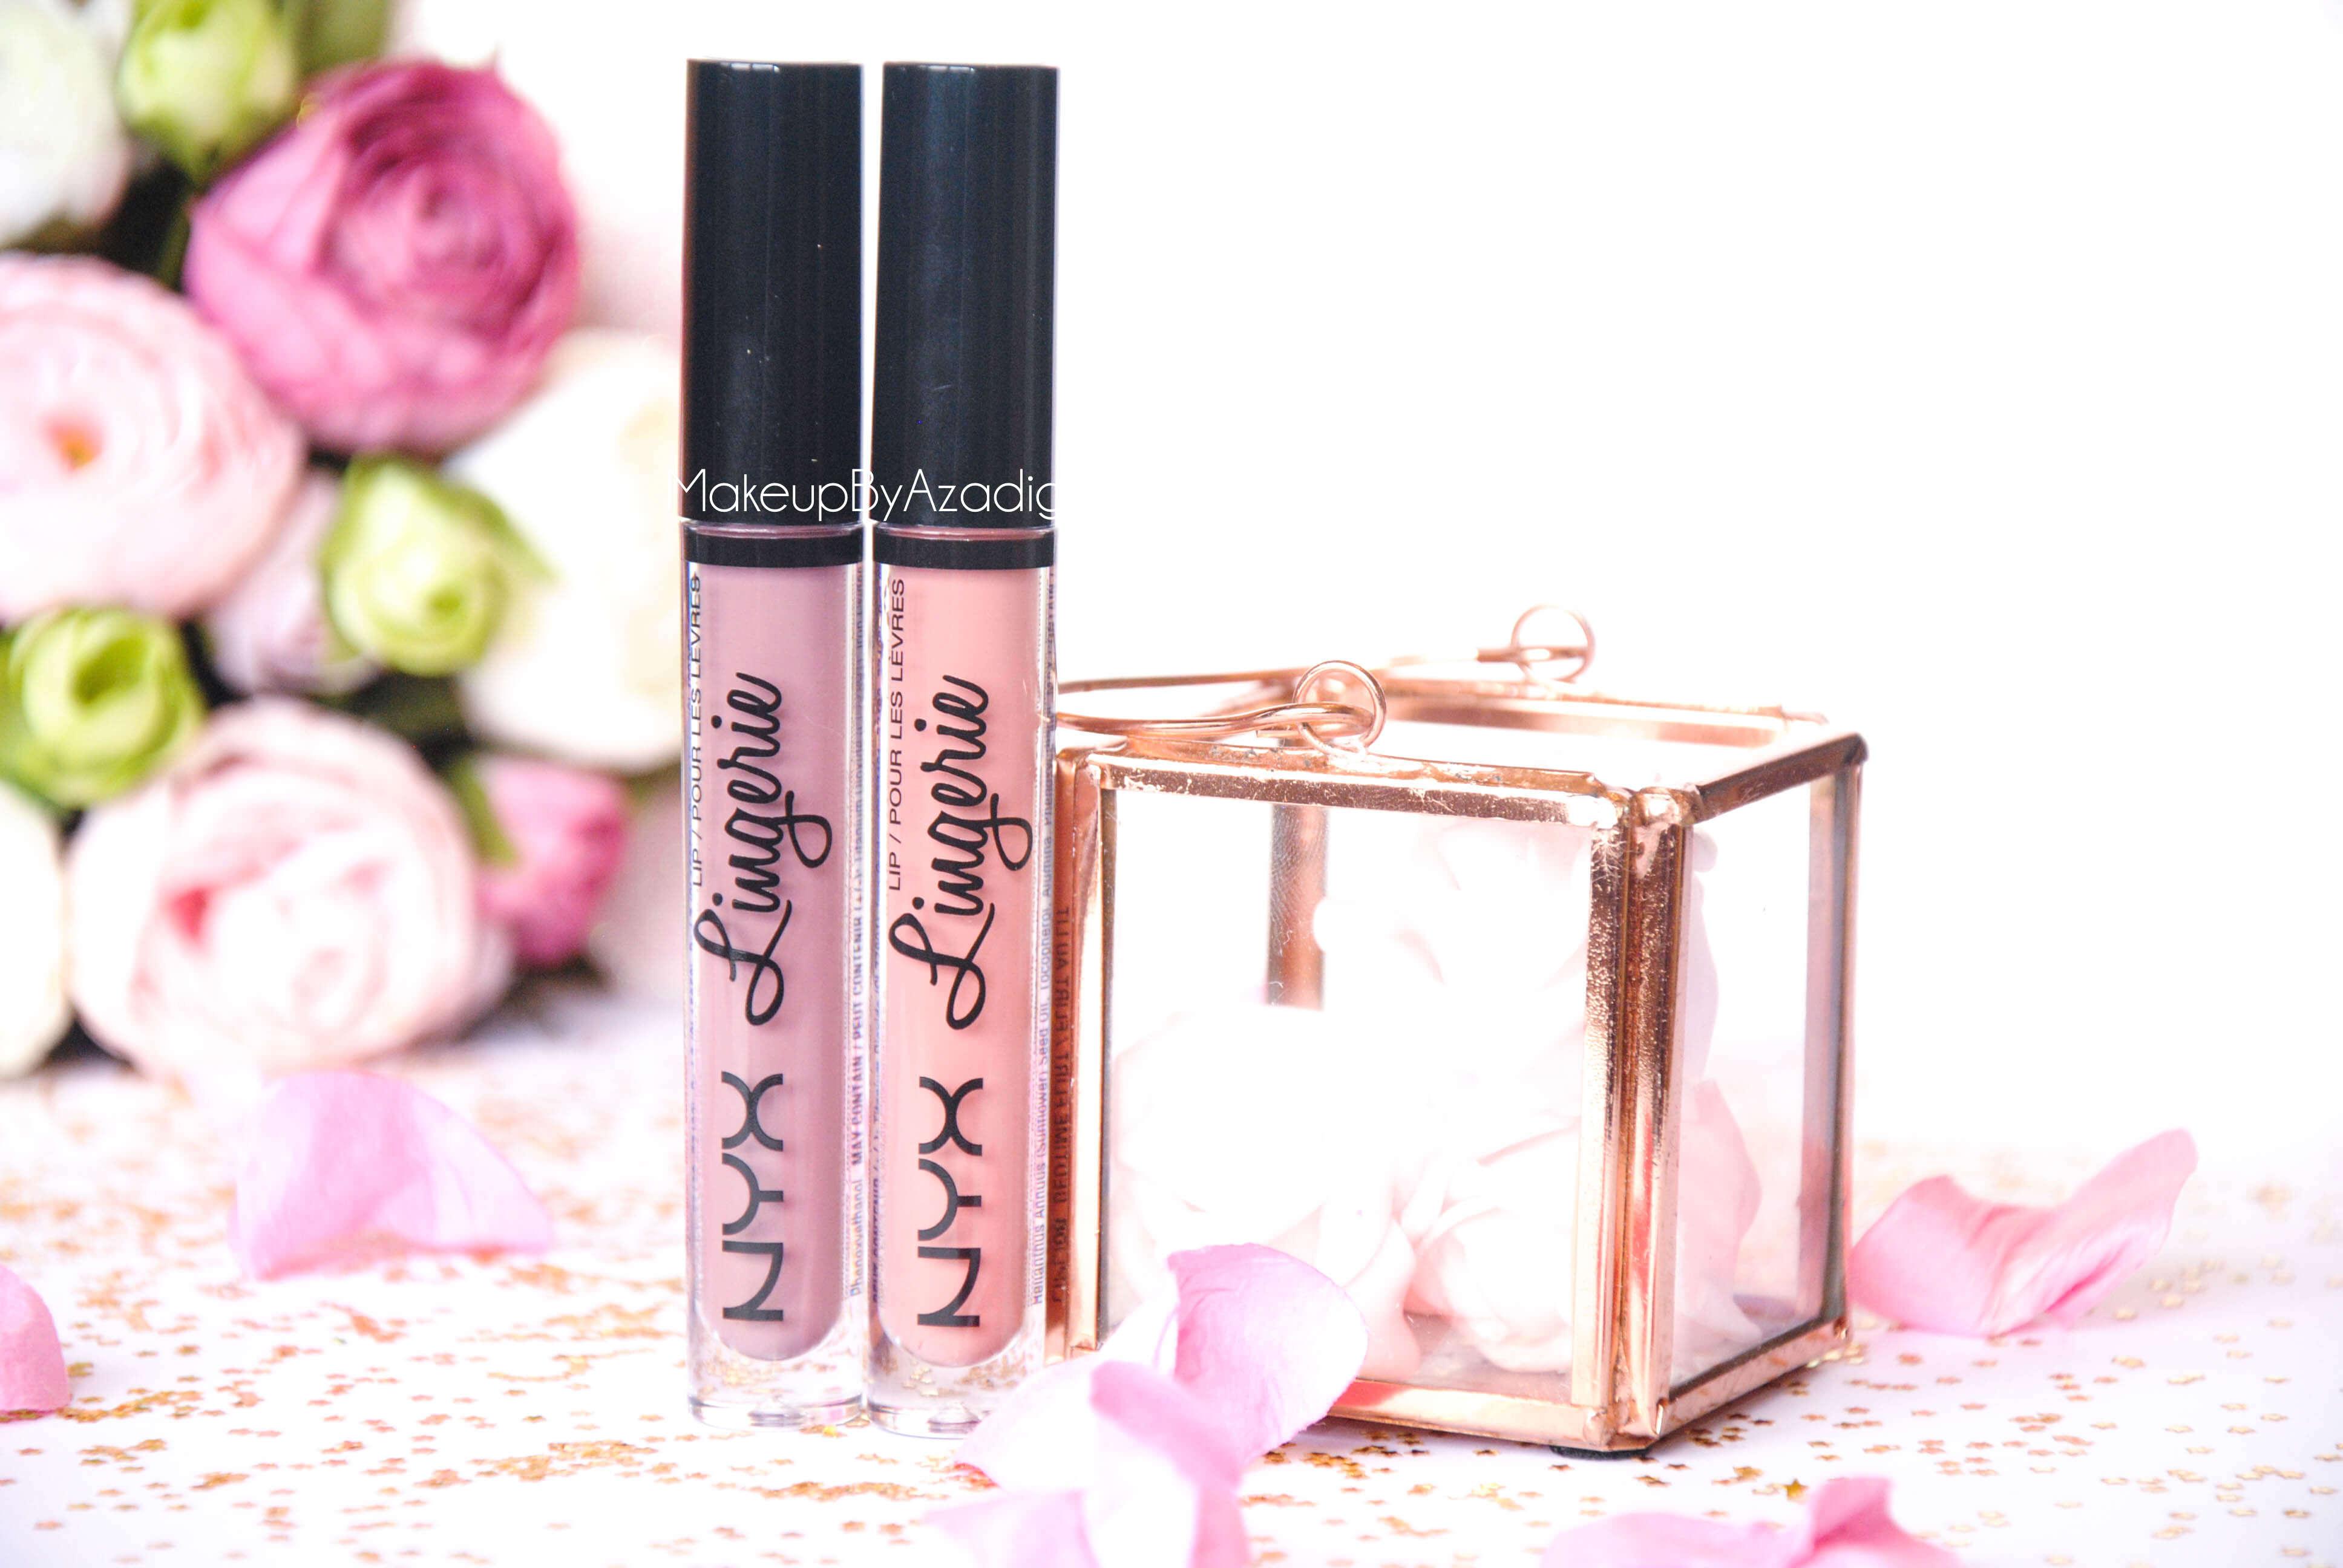 lip lingerie - revue - swatch- nyx cosmetics - embellishment - bedtime flirt - makeupbyazadig - enjoyphoenix - troyes - rose